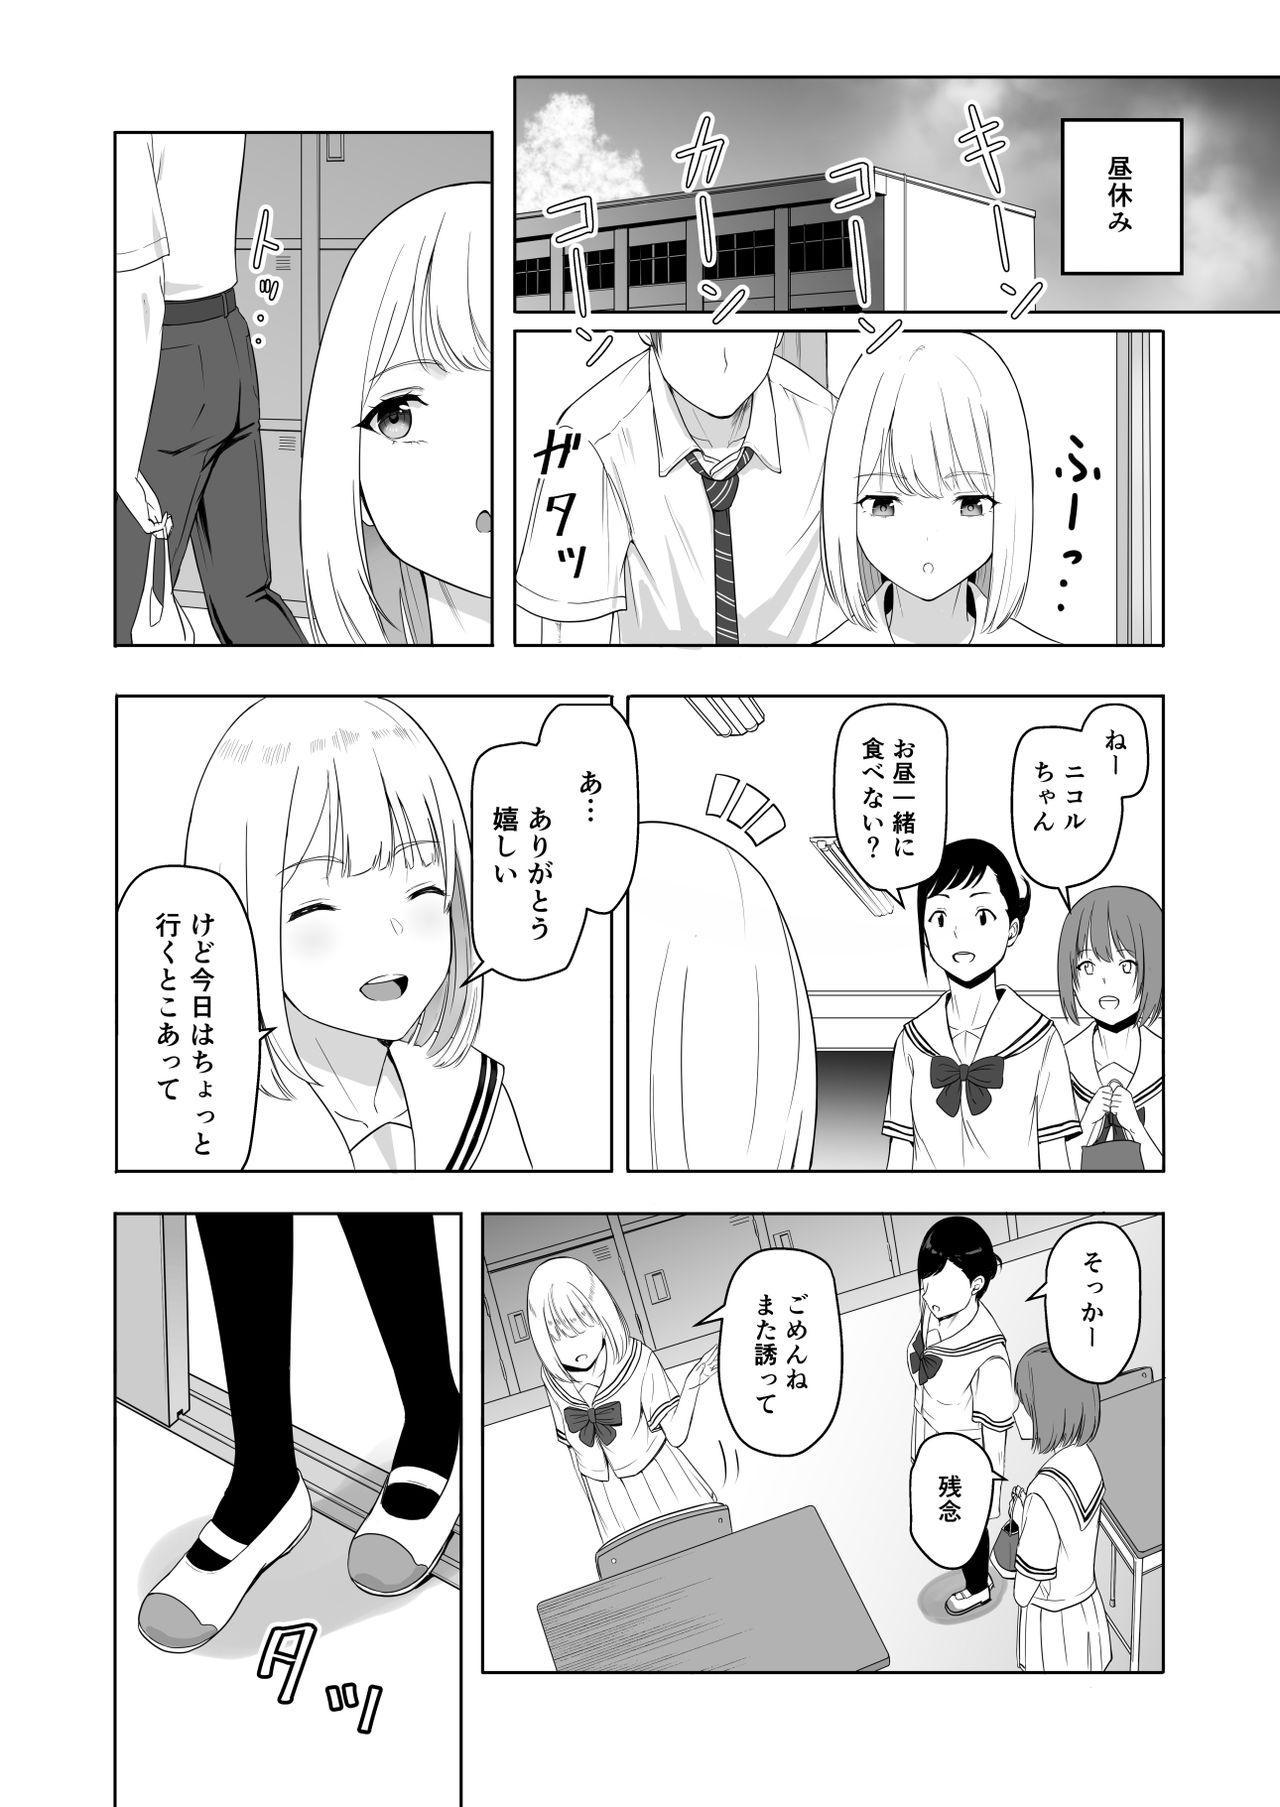 Kimi ga Tame. 2 Ichikawa Inori 12